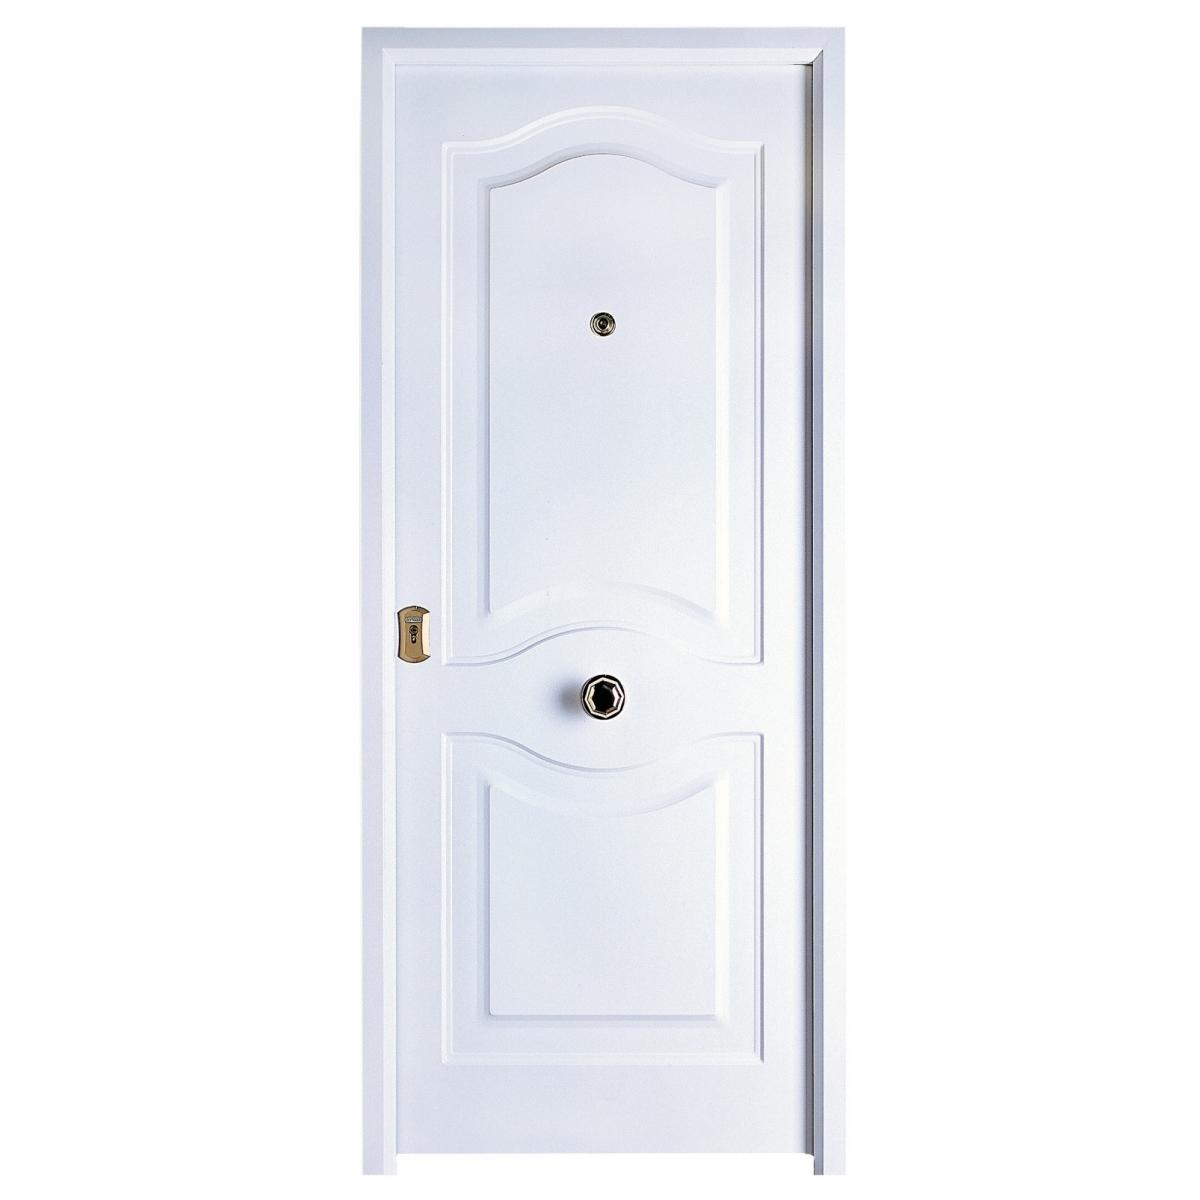 Puerta acorazada Cearco - Puertas acorazadas Serie B4-BL - Marca Cearco